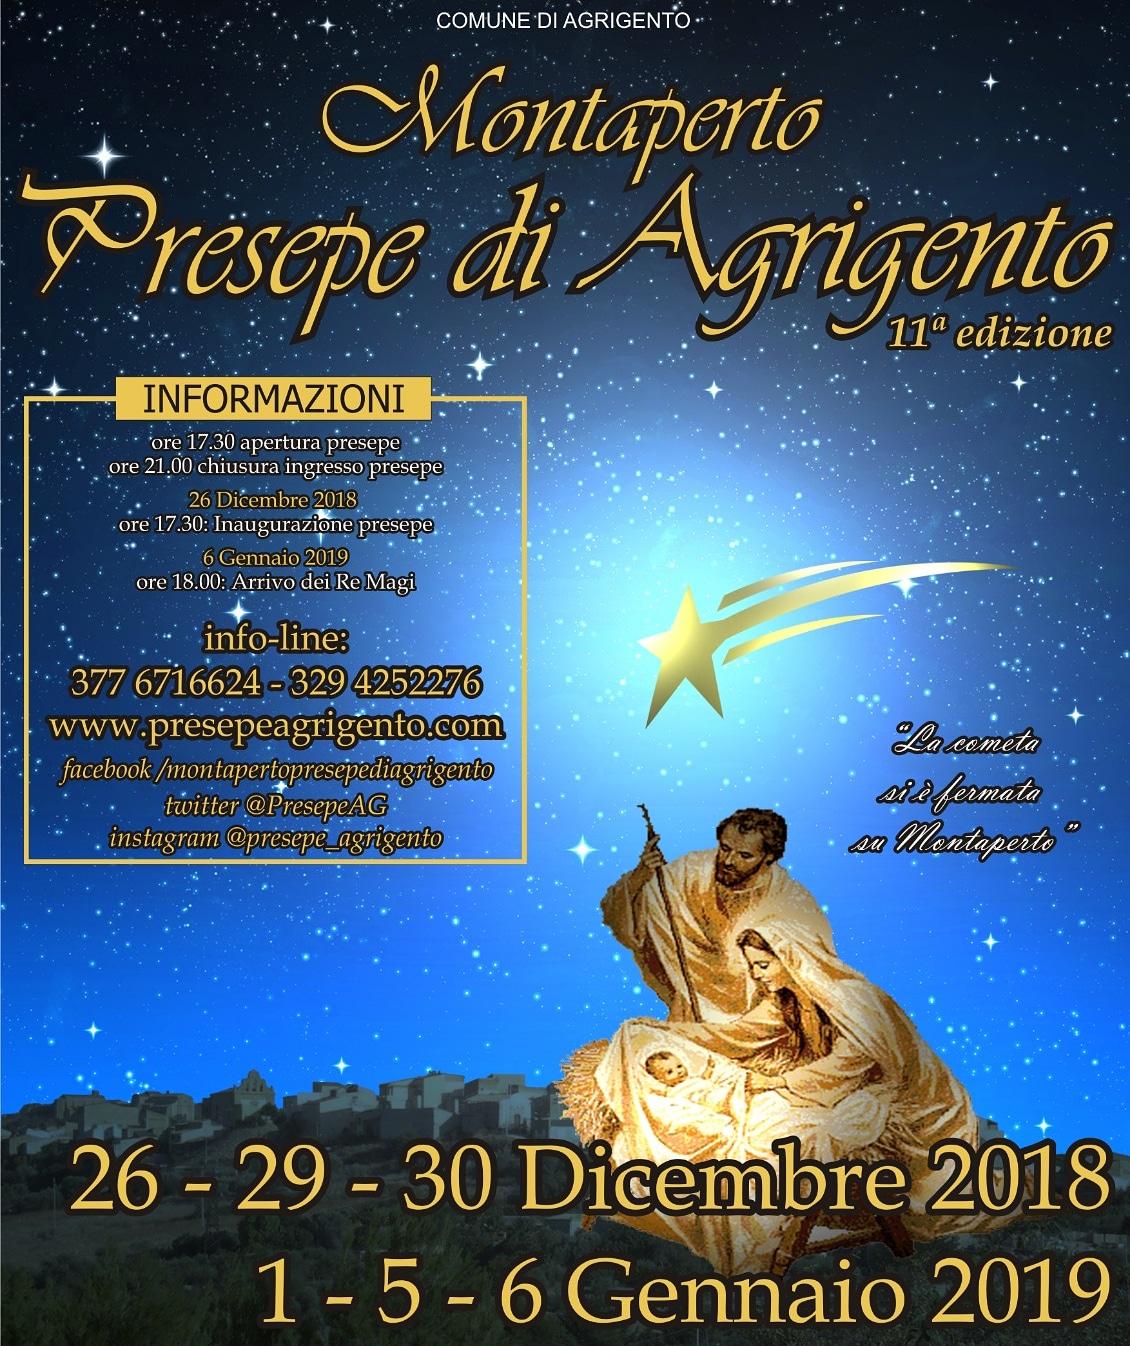 Presepe Montaperto - Agrigento